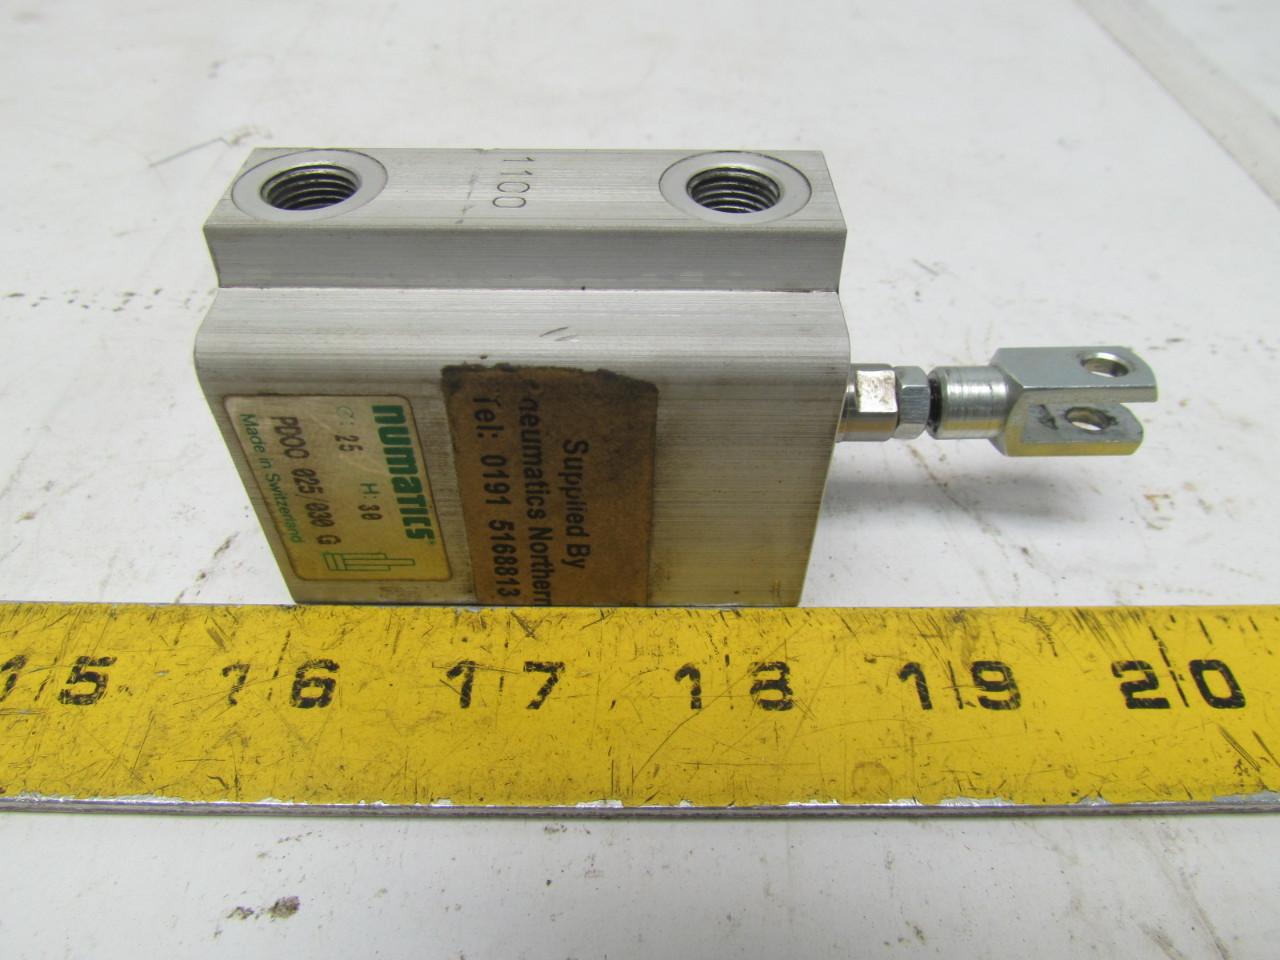 Numatics PDOO 025/030 Pneumatic Air Cylinder 30mm Stroke ...